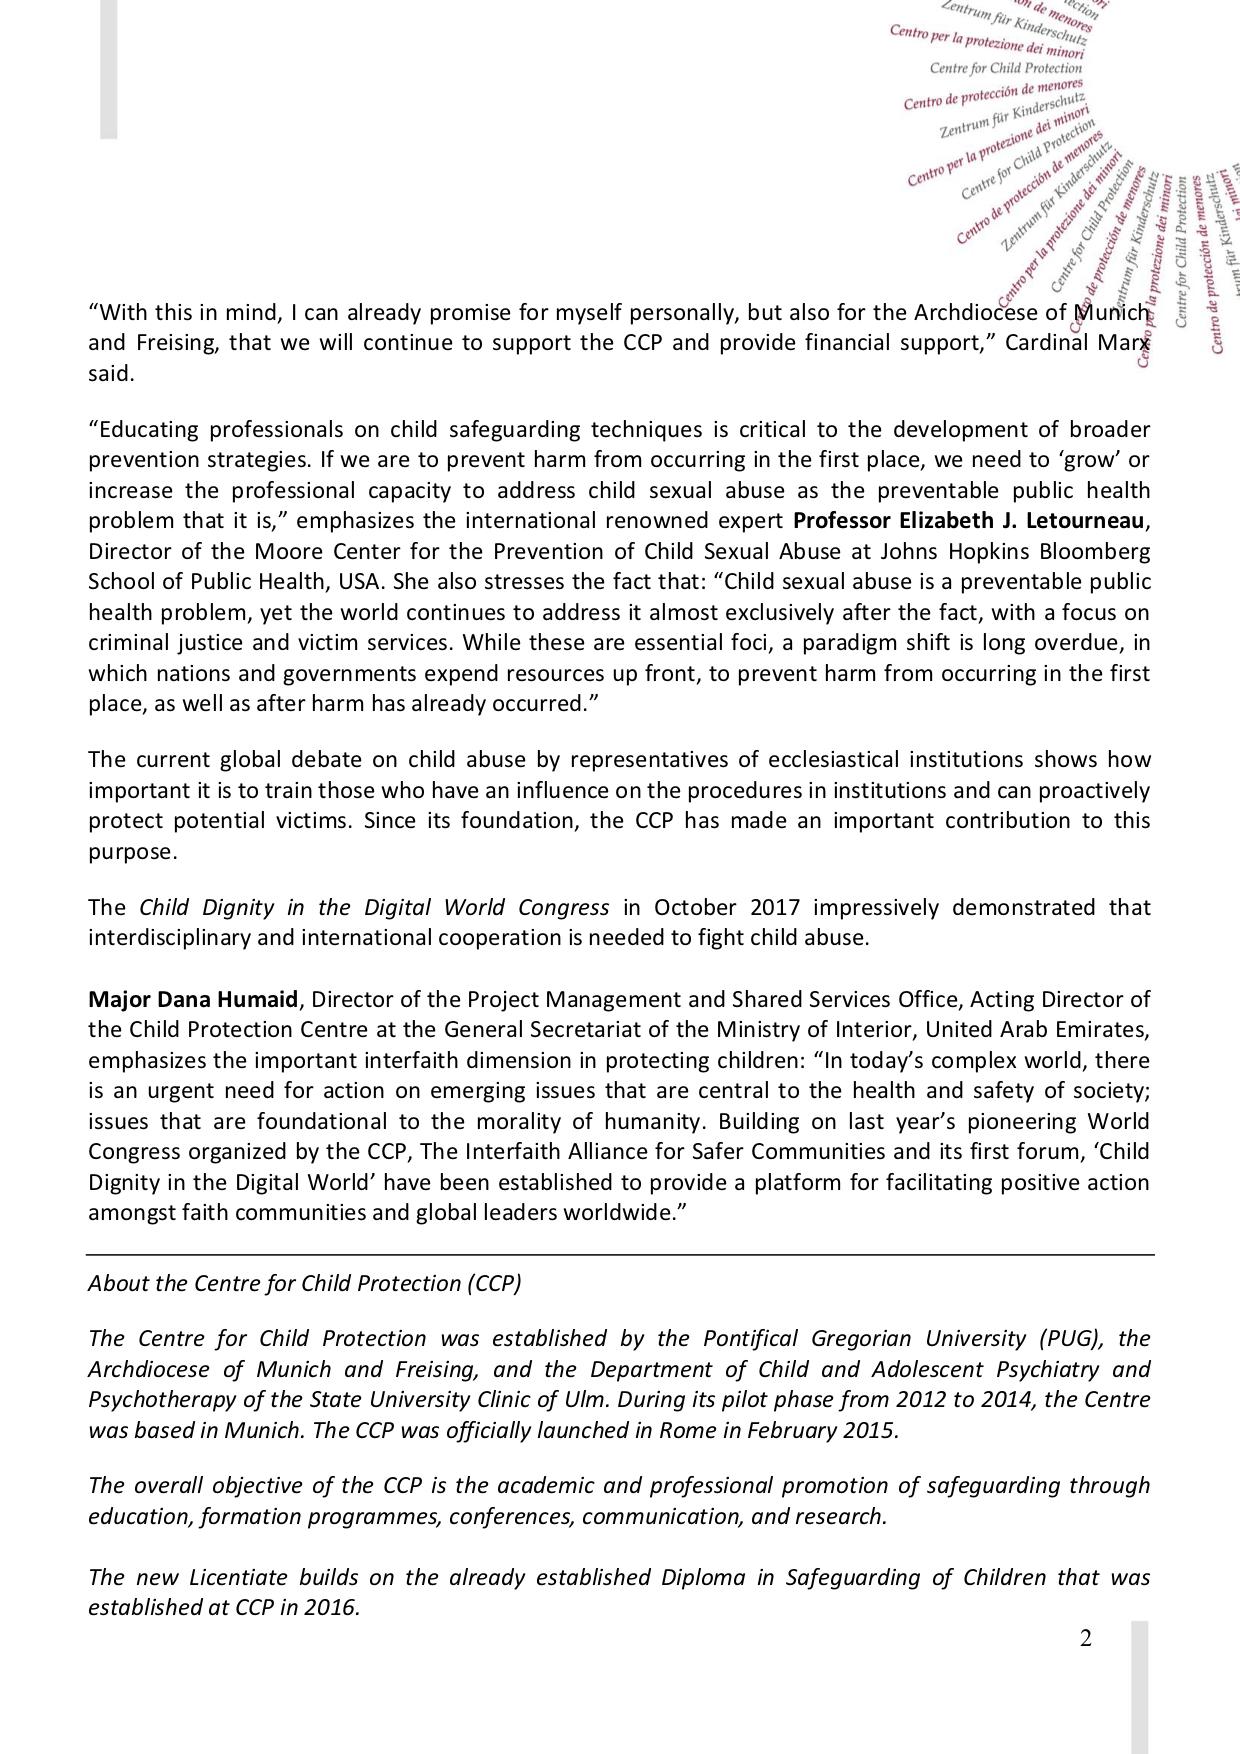 2018.10.04-Licentiate-Inauguration_Press-Release.jpg